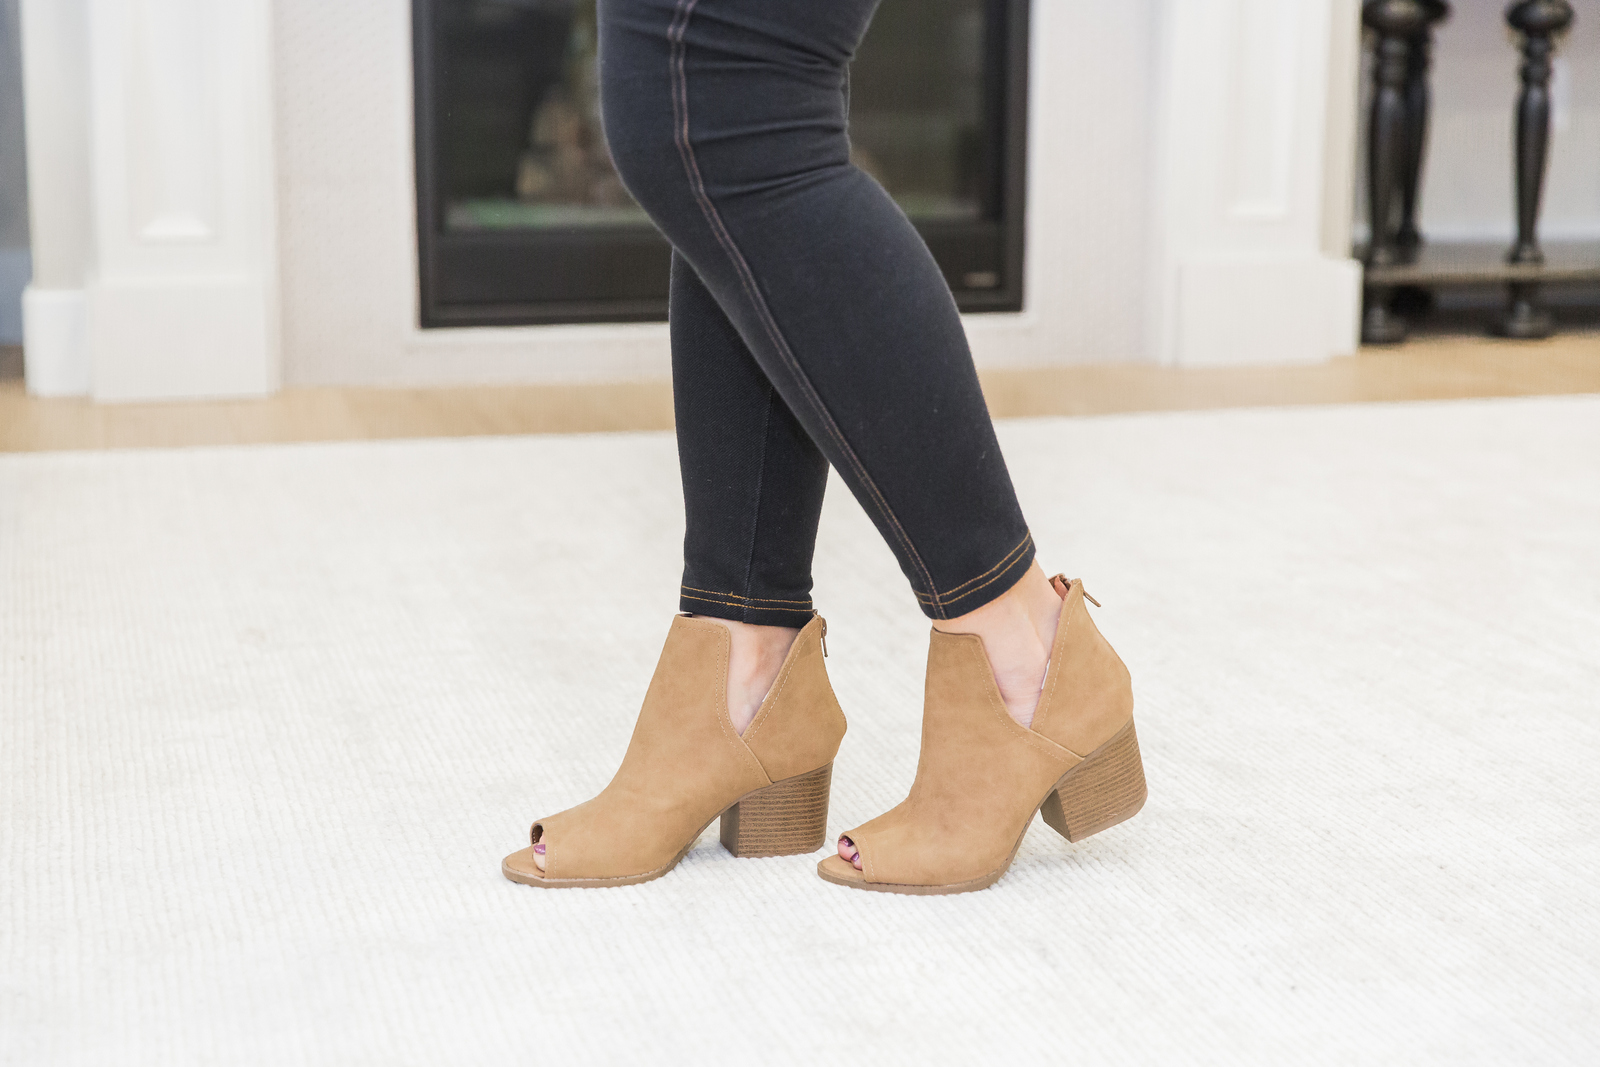 Brickyard Buffalo Guest Editor Week - Sandy A La Mode: Cut out booties